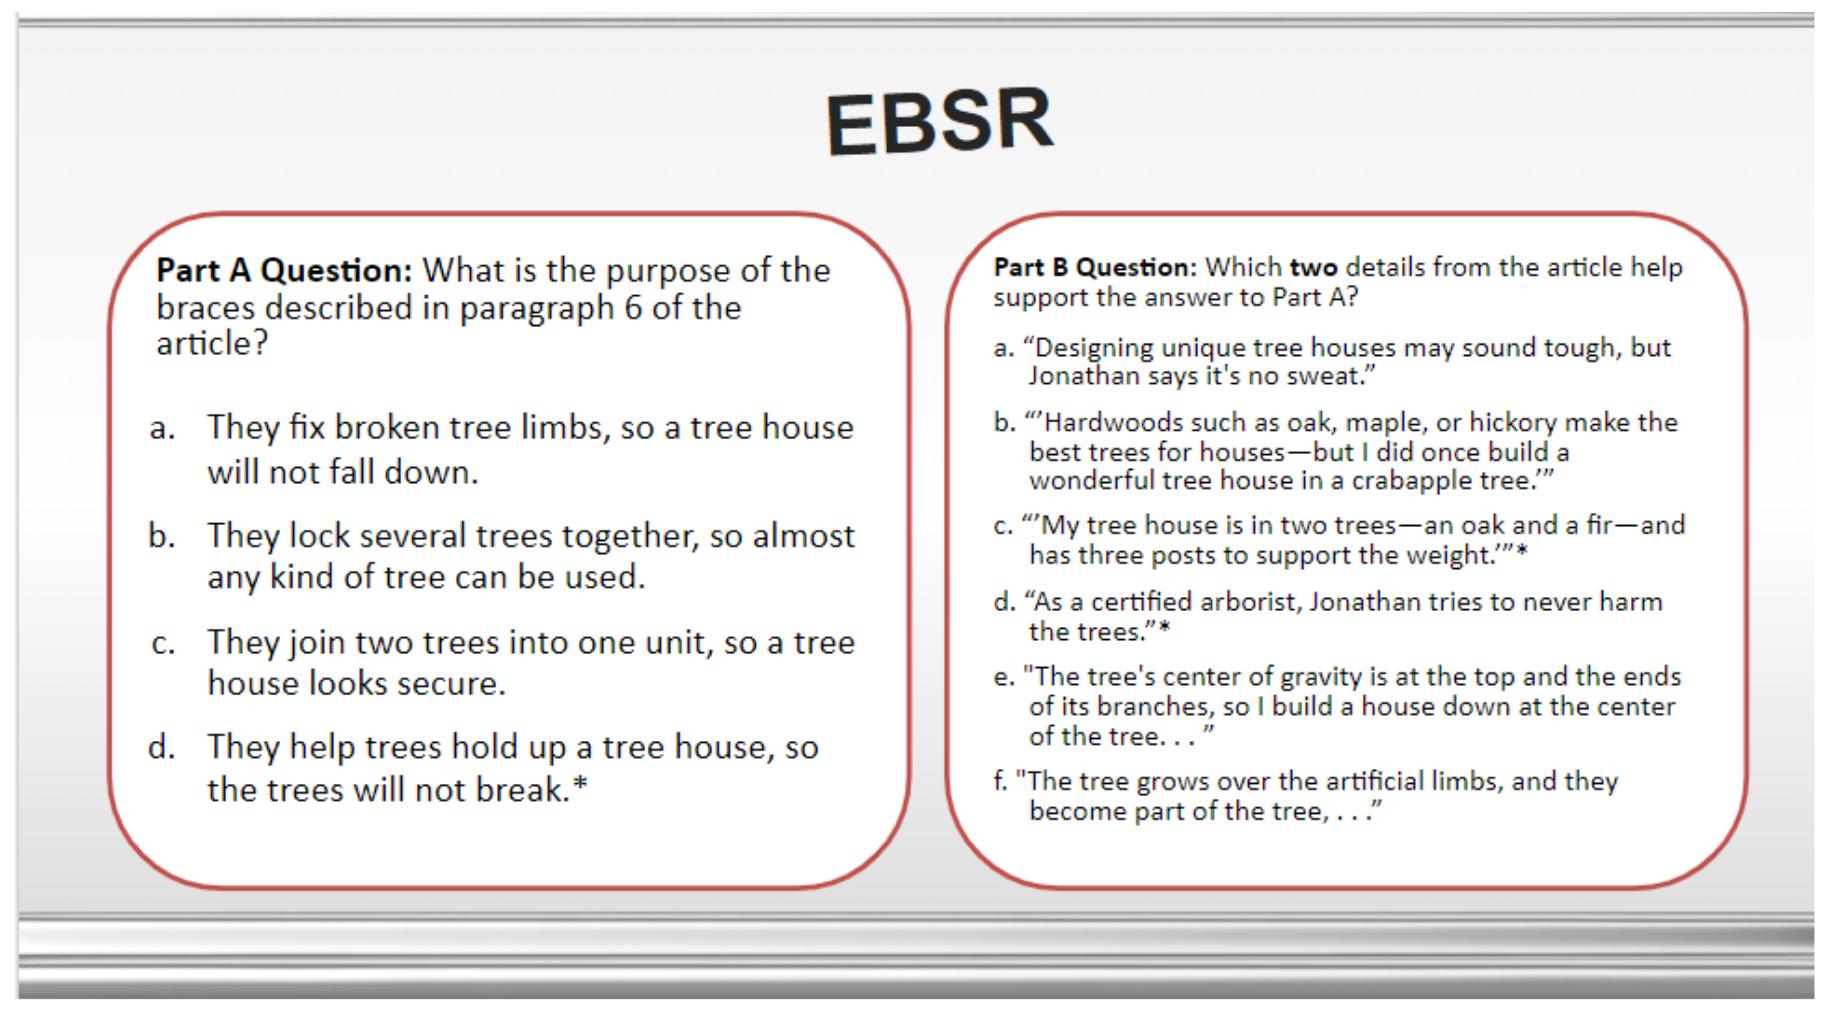 EBSR Question